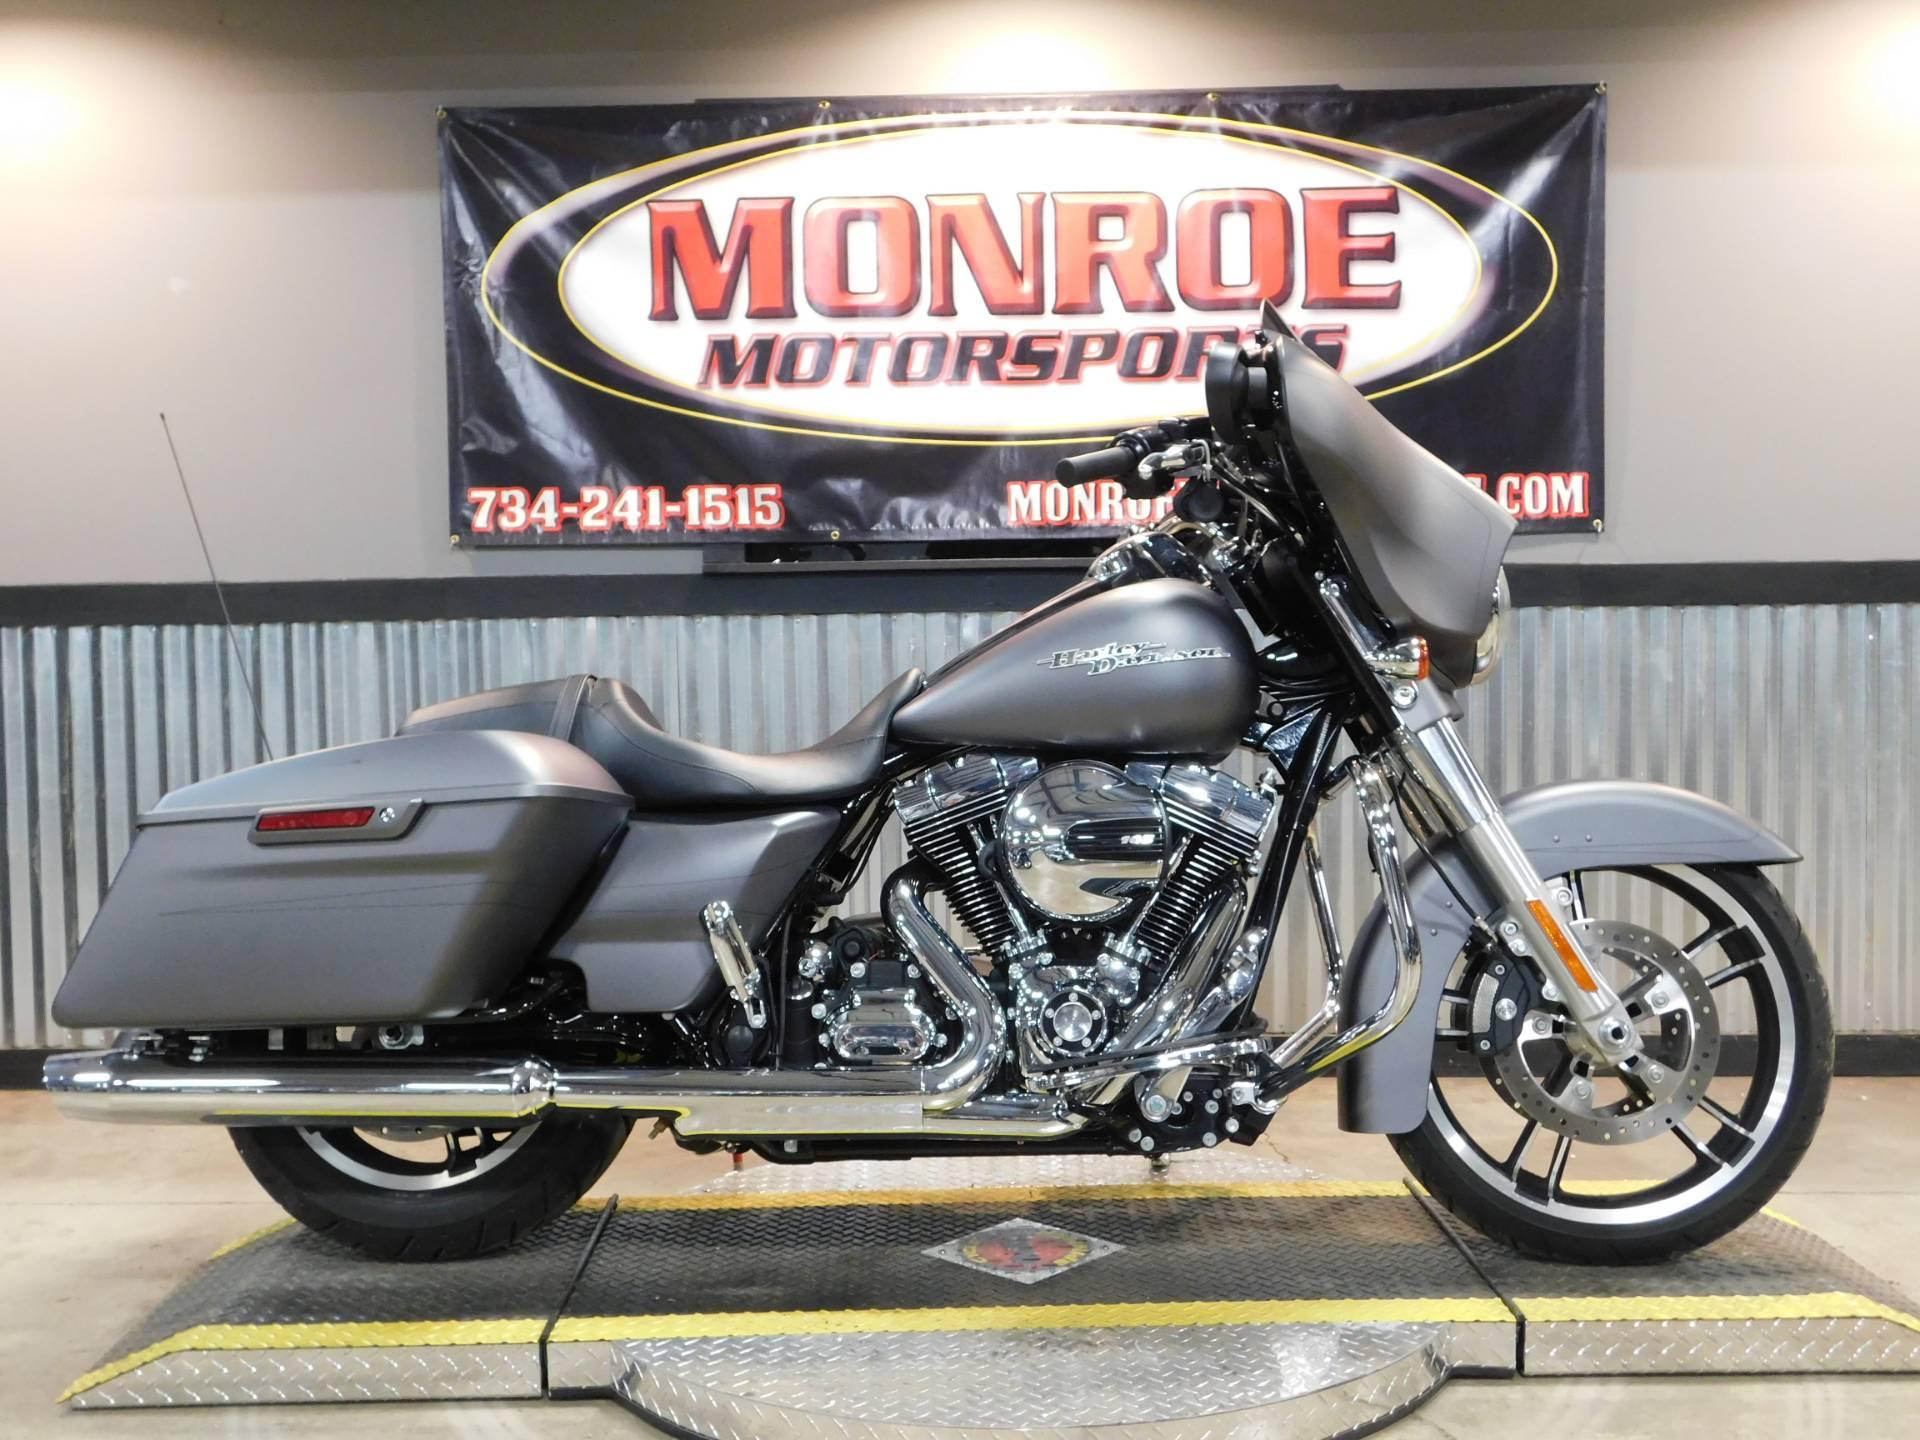 2016 Harley Davidson Street Glide Special In Monroe Michigan